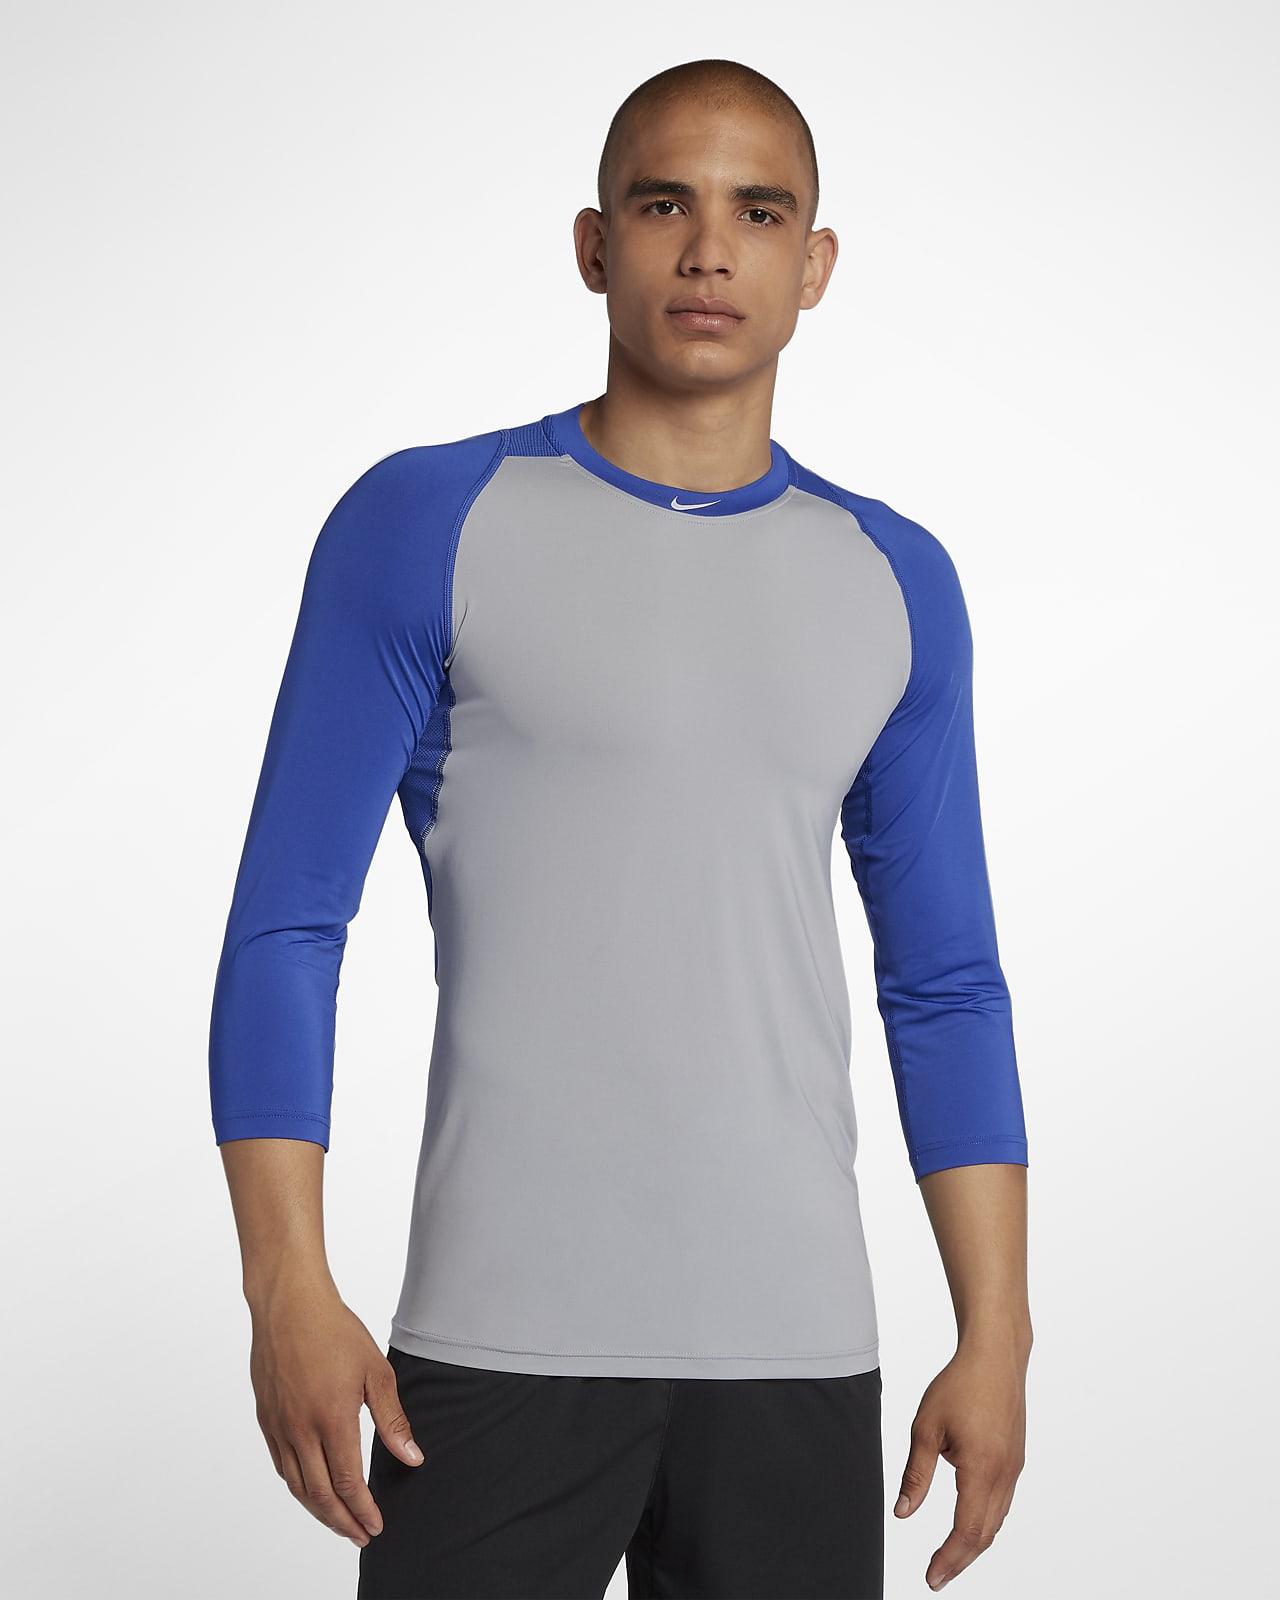 Nike Pro Men's 3/4 Sleeve Baseball Top